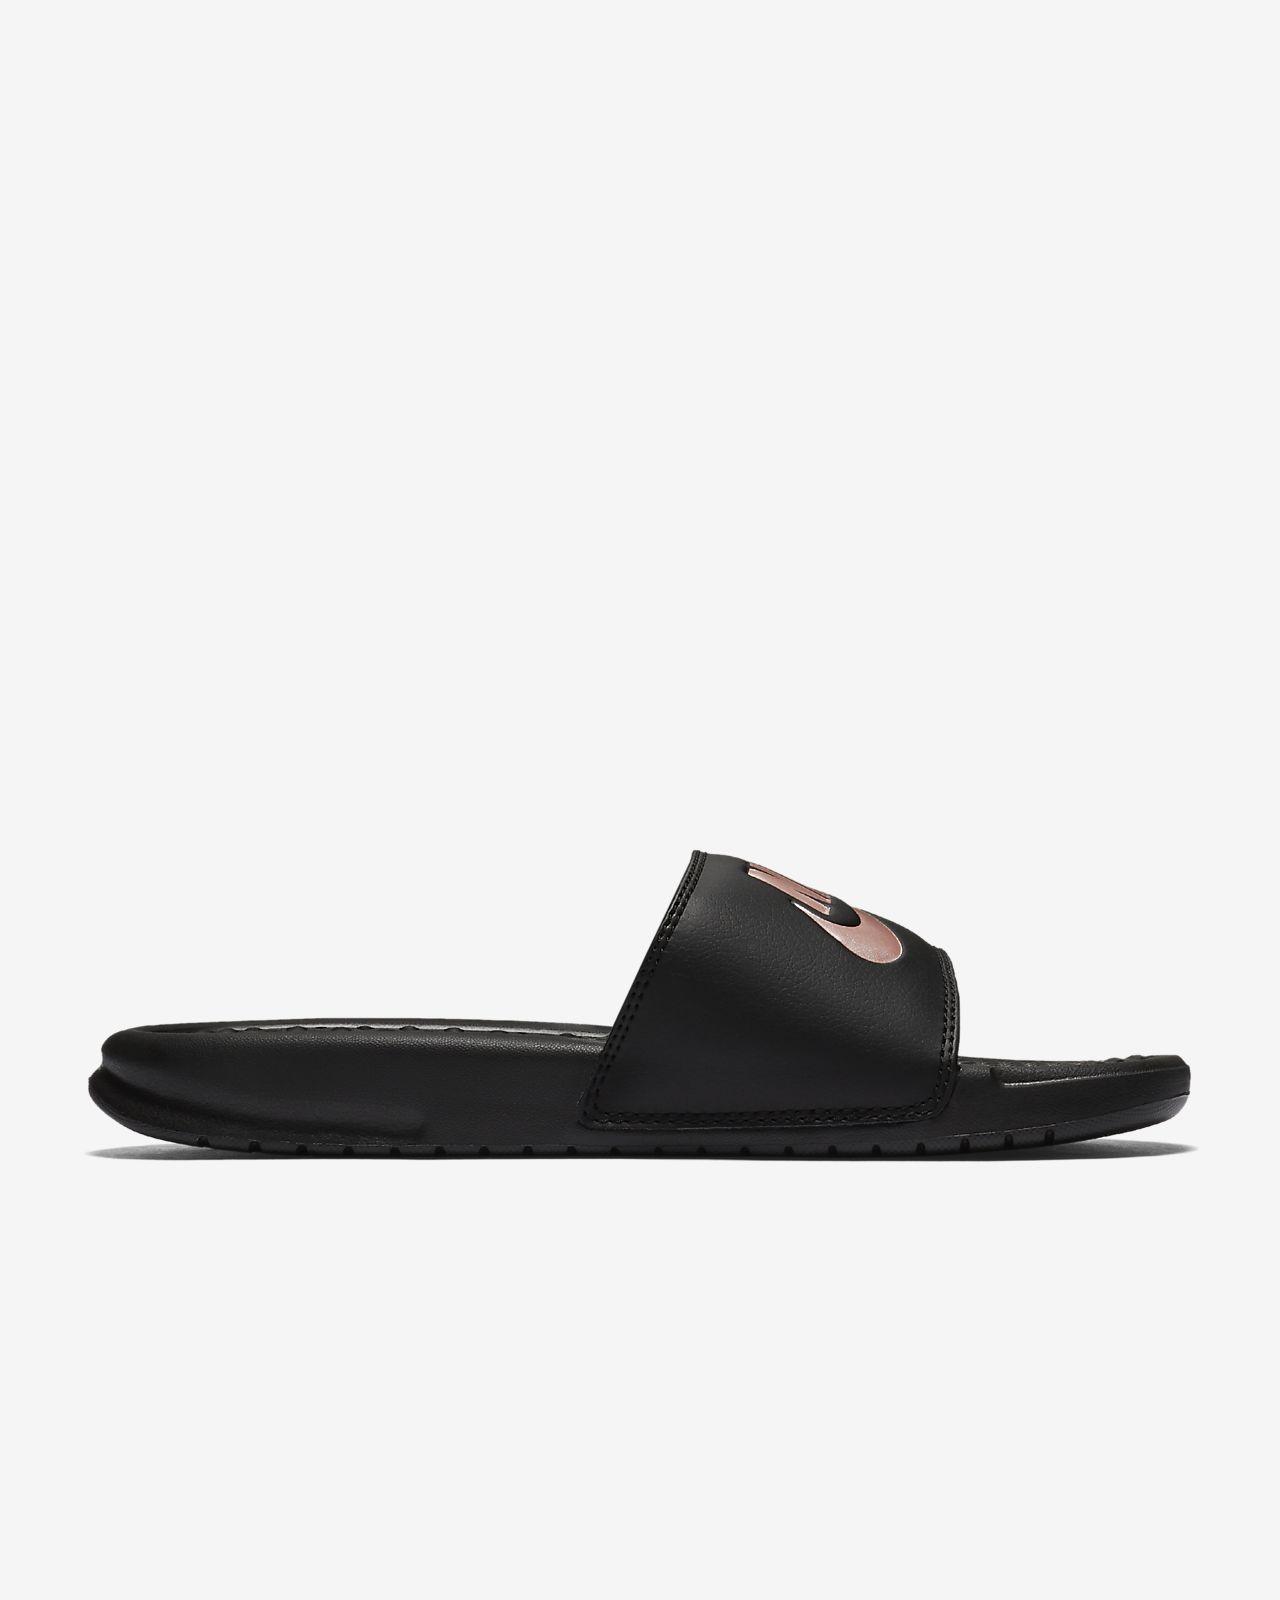 nike slippers gold logo